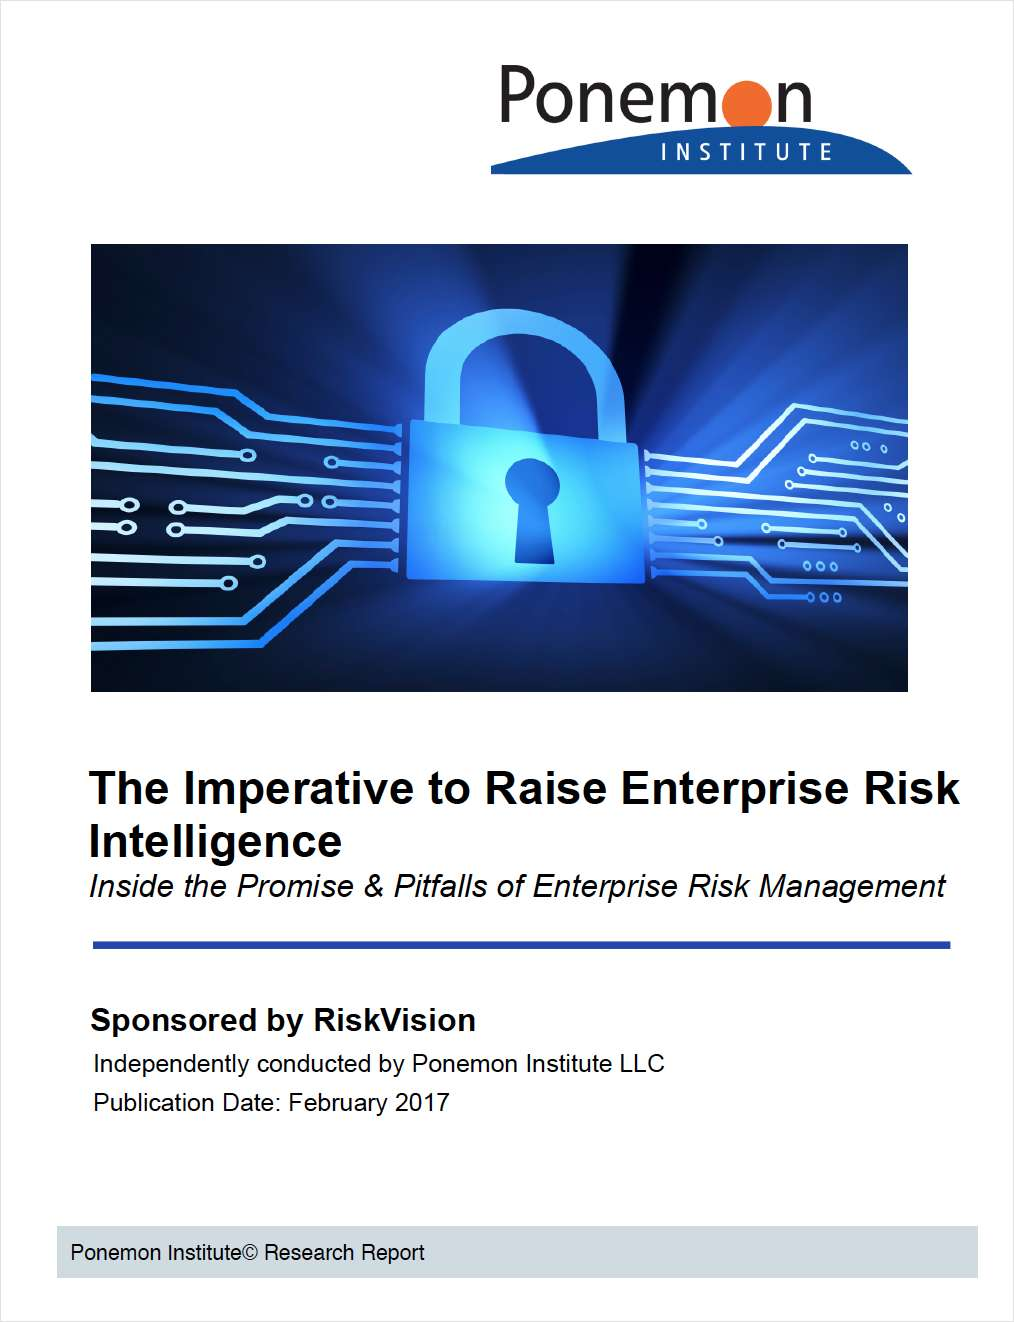 The Imperative to Raise Enterprise Risk Intelligence